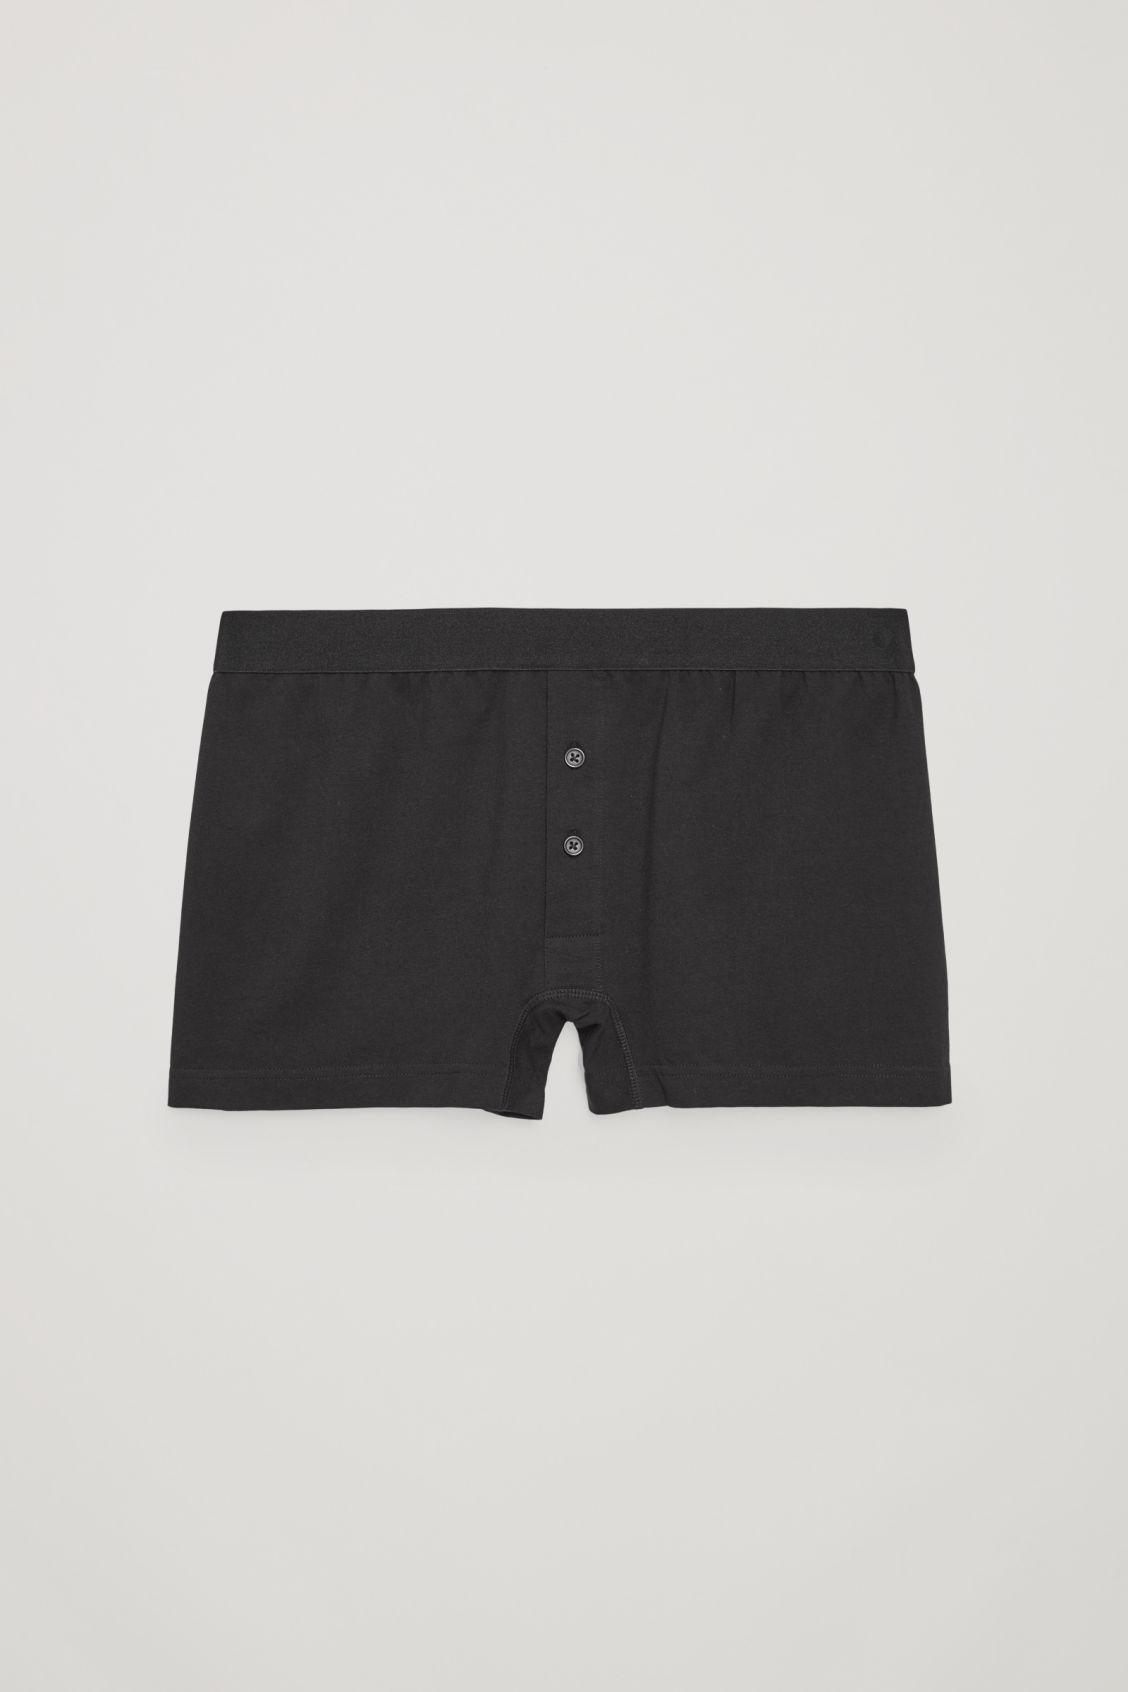 Cos Cotton-jersey Boxer Briefs In Black